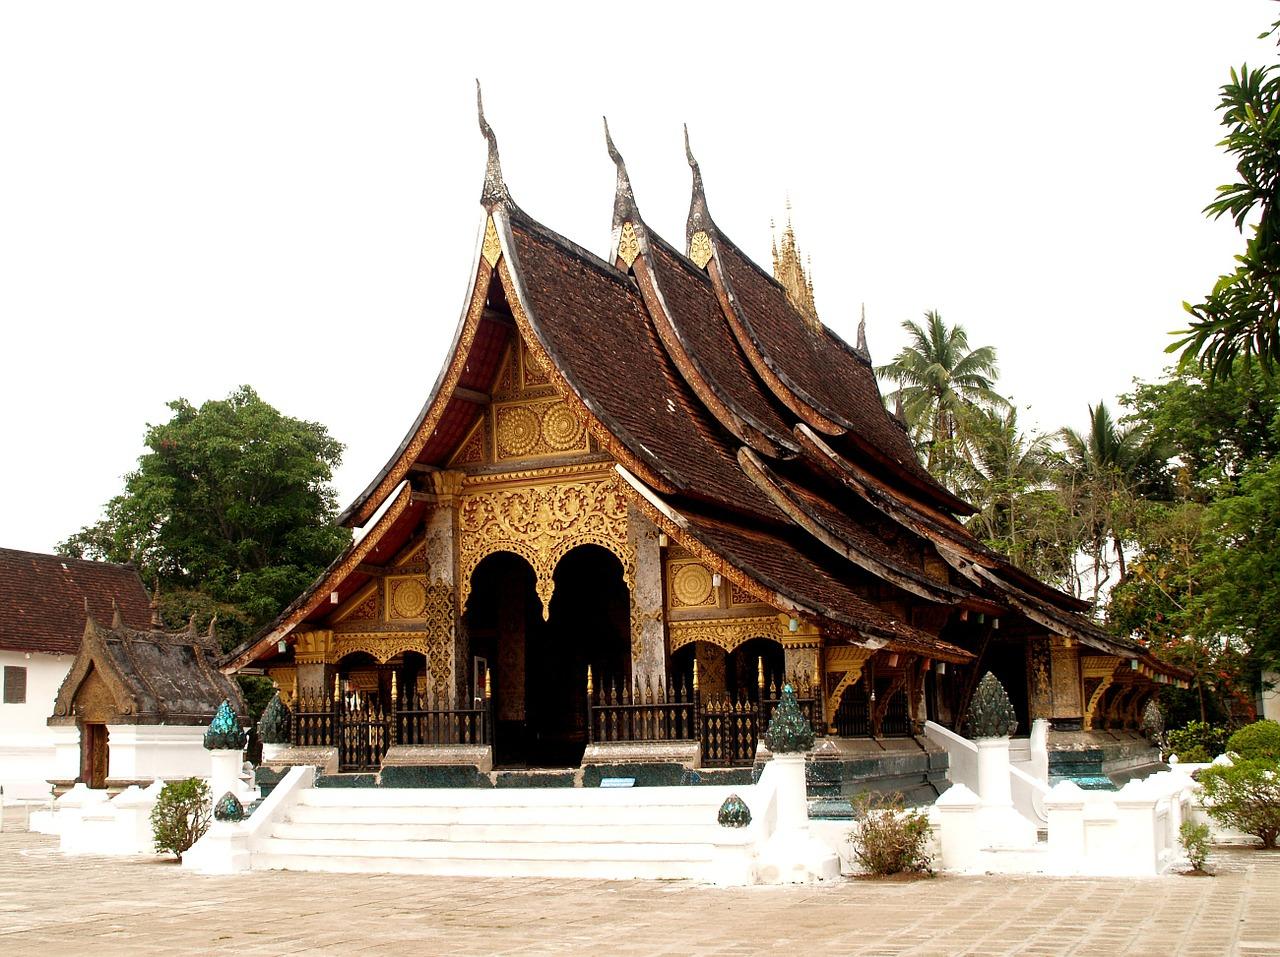 temple-142258_1280